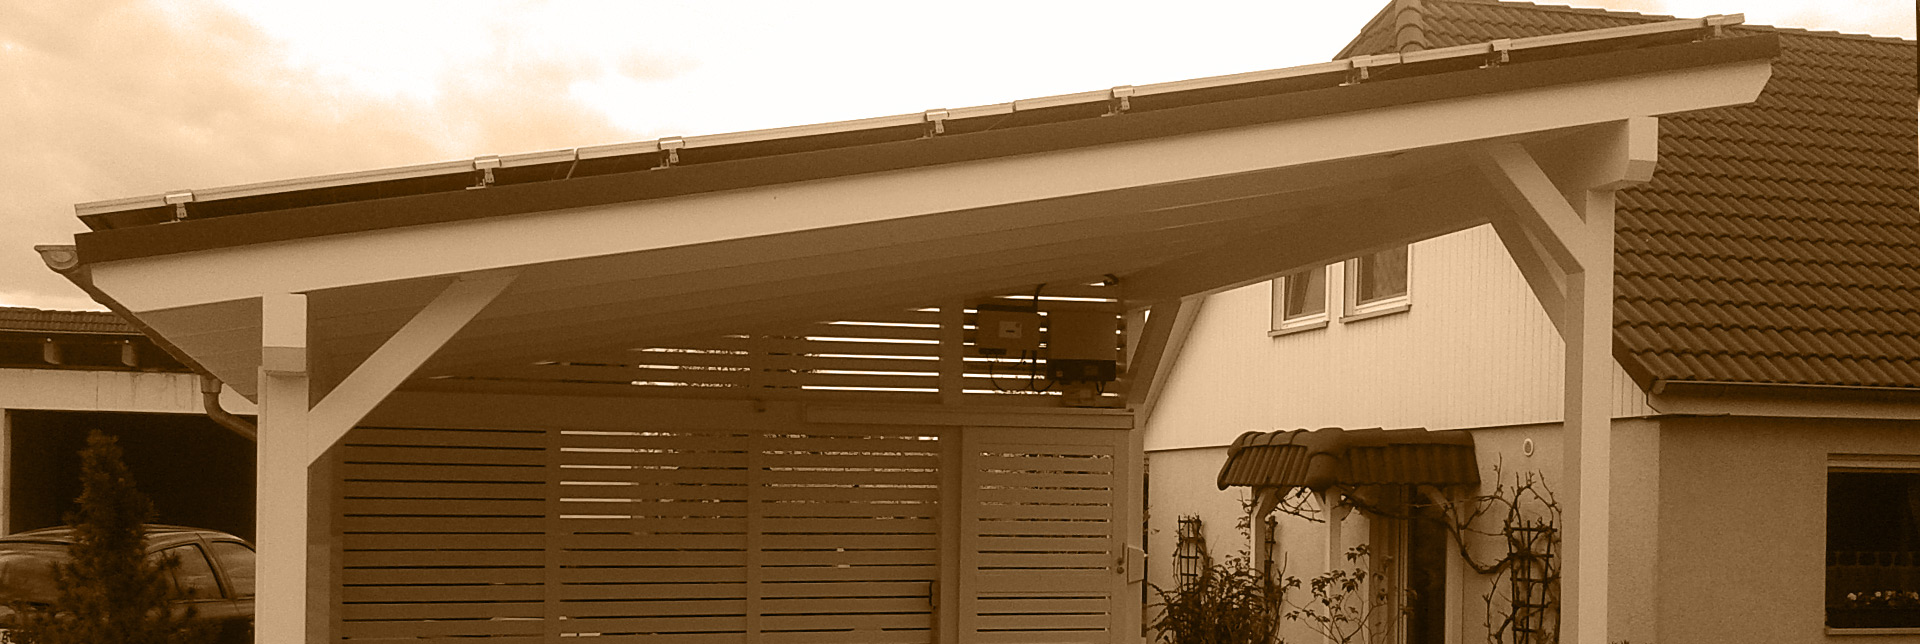 carport g nstig aus polen carport holz g nstig ej94 hitoiro carport aus polen my blog polen. Black Bedroom Furniture Sets. Home Design Ideas